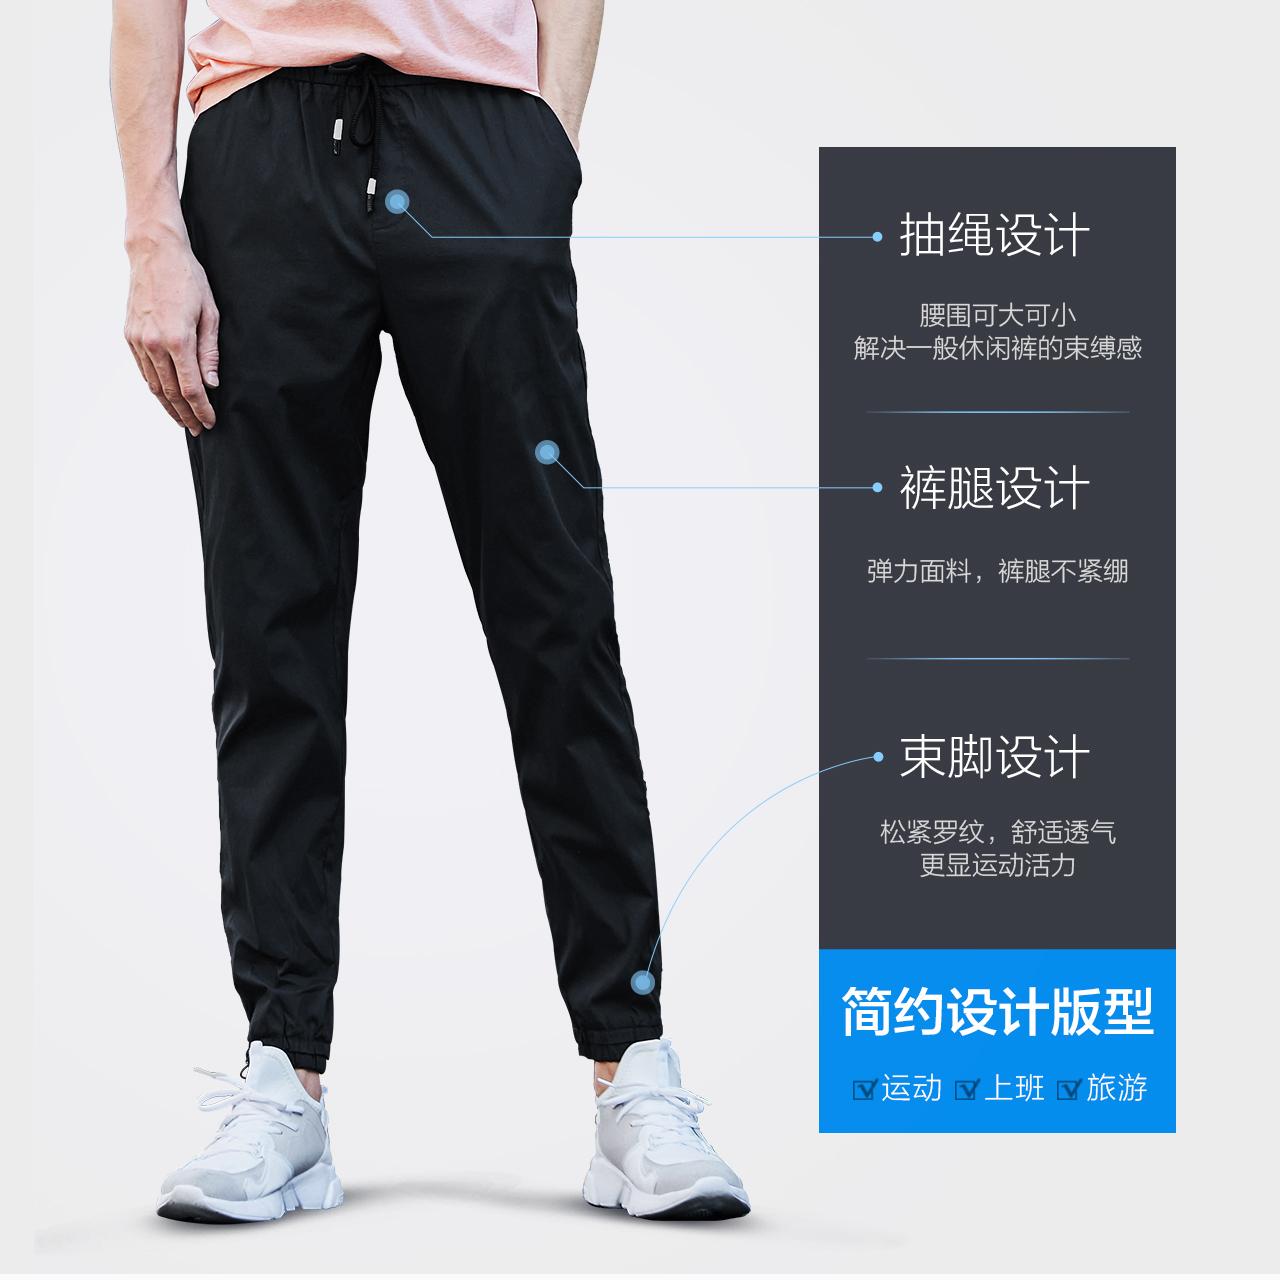 GLM男装束脚裤小脚裤休闲裤男秋季裤子韩版潮流百搭休闲长裤男裤